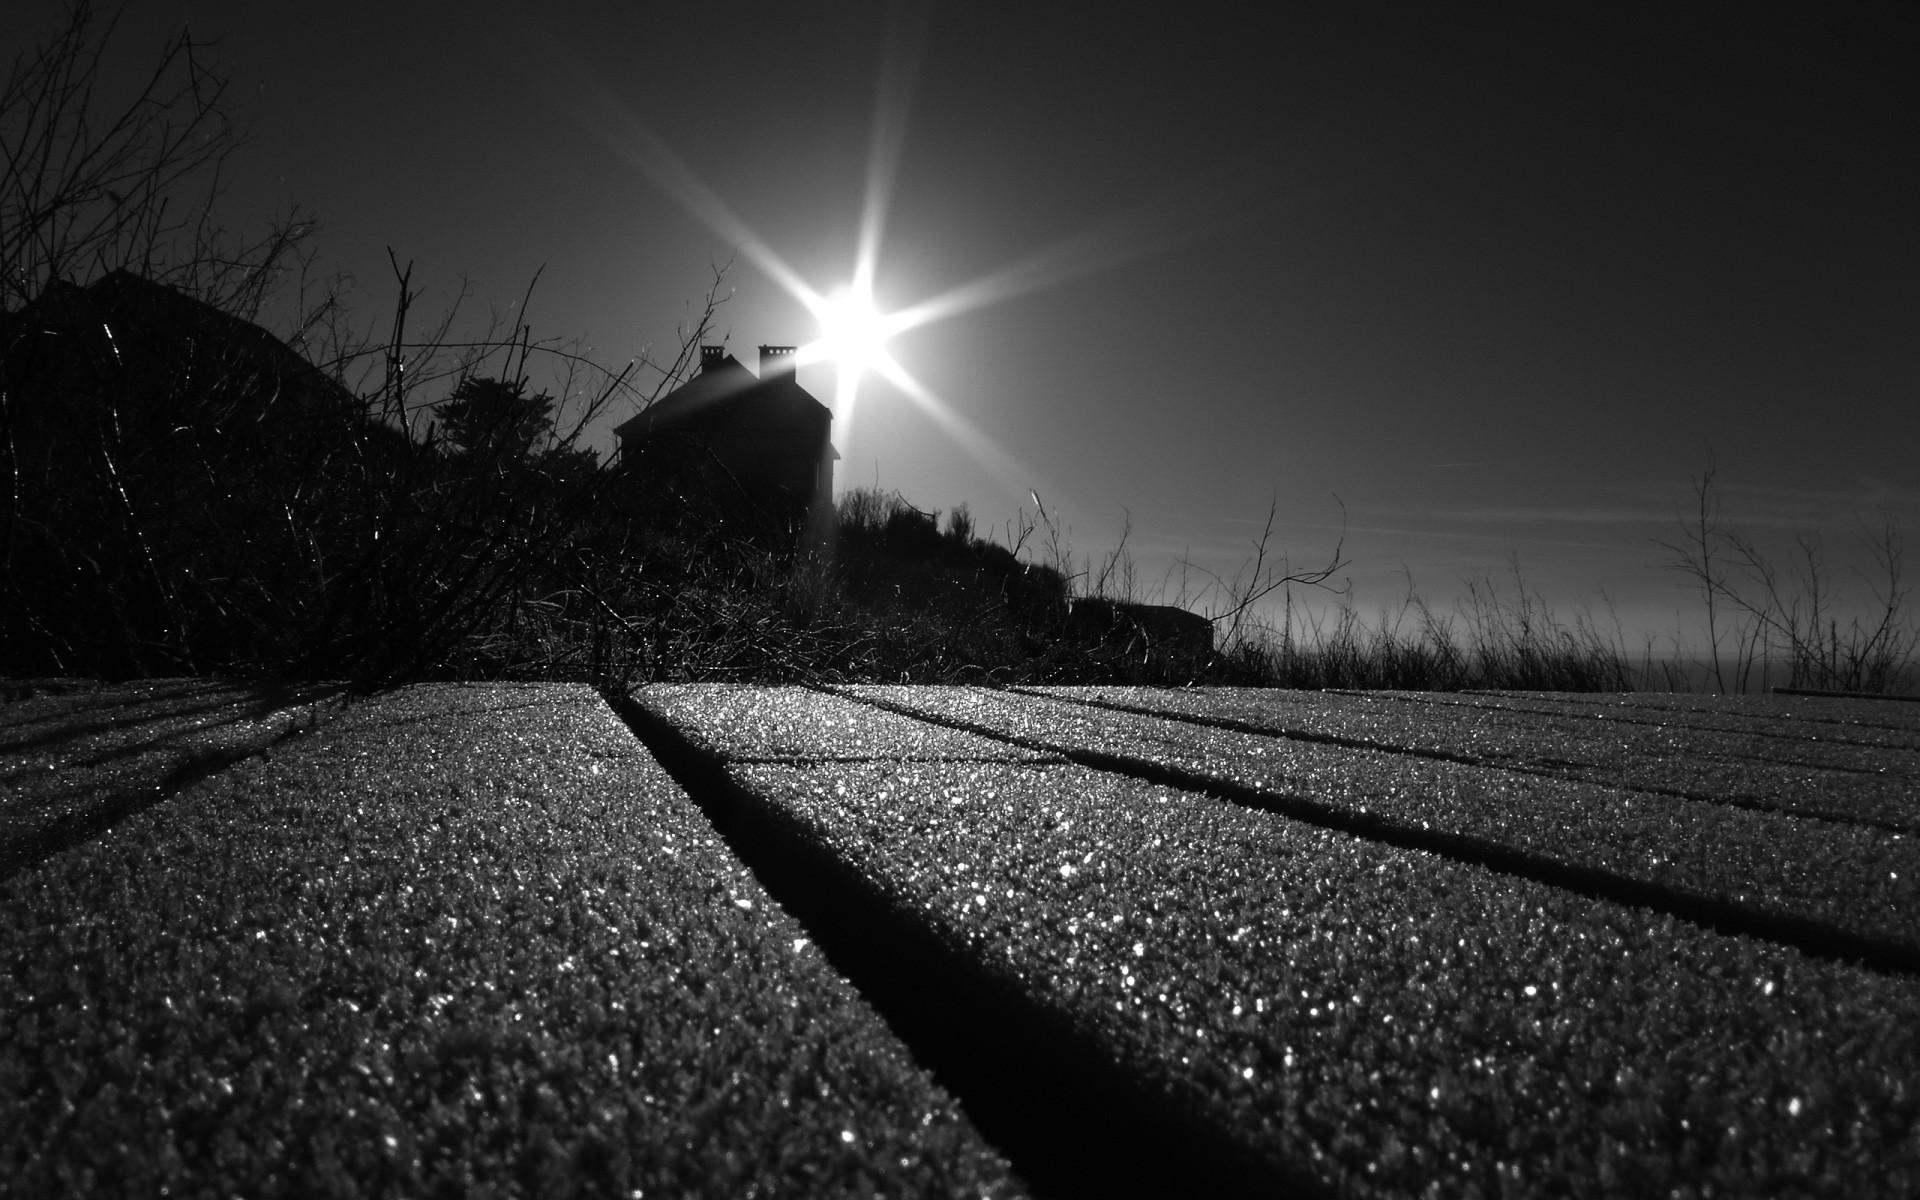 Download: Ocean Deck Morning Light HD Wallpaper